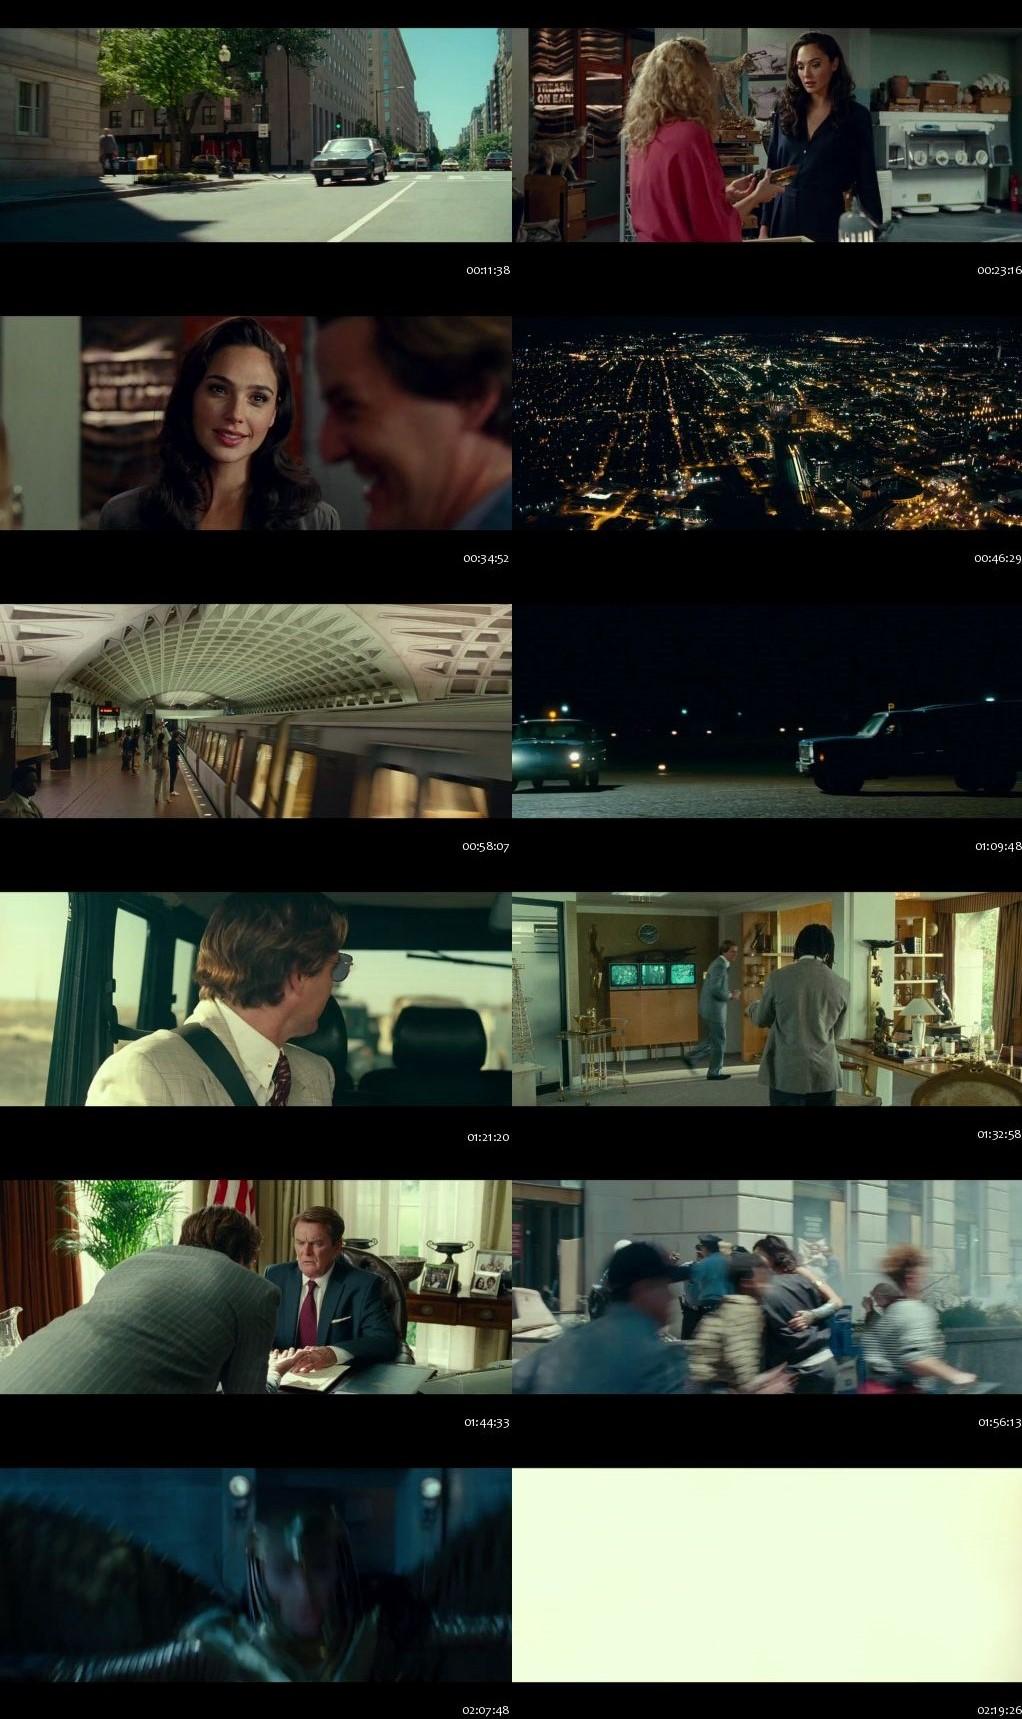 Wonder Woman 1984 (2020) English WEBRip 720p